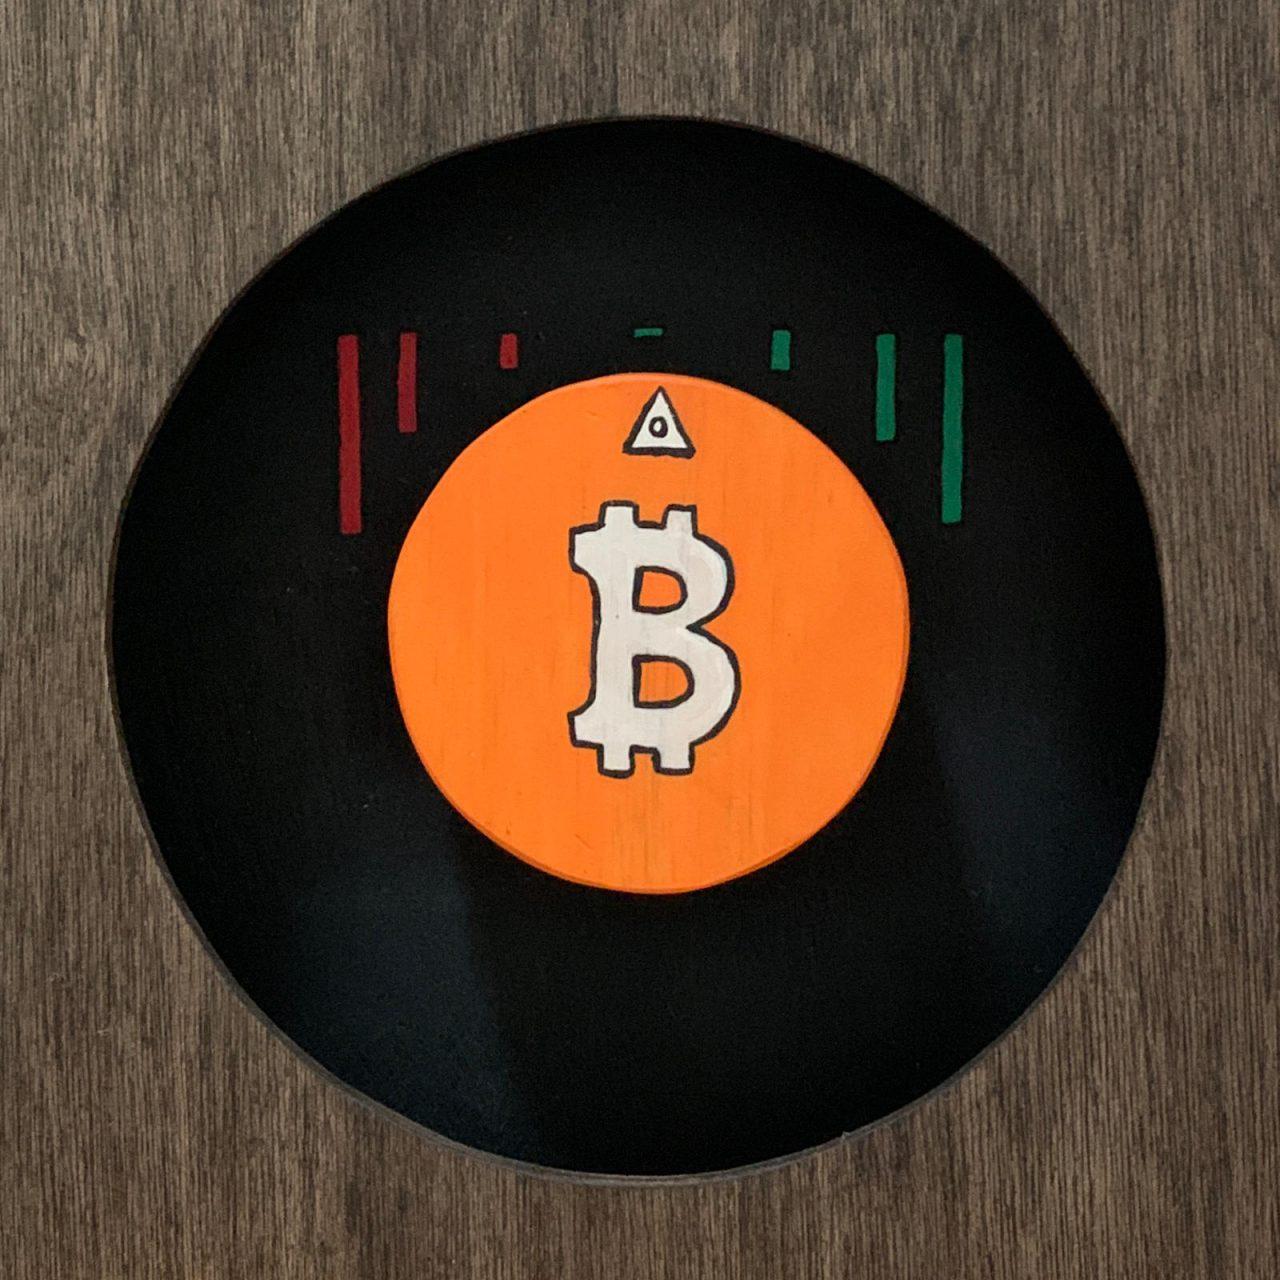 Bitcoin sculpture back